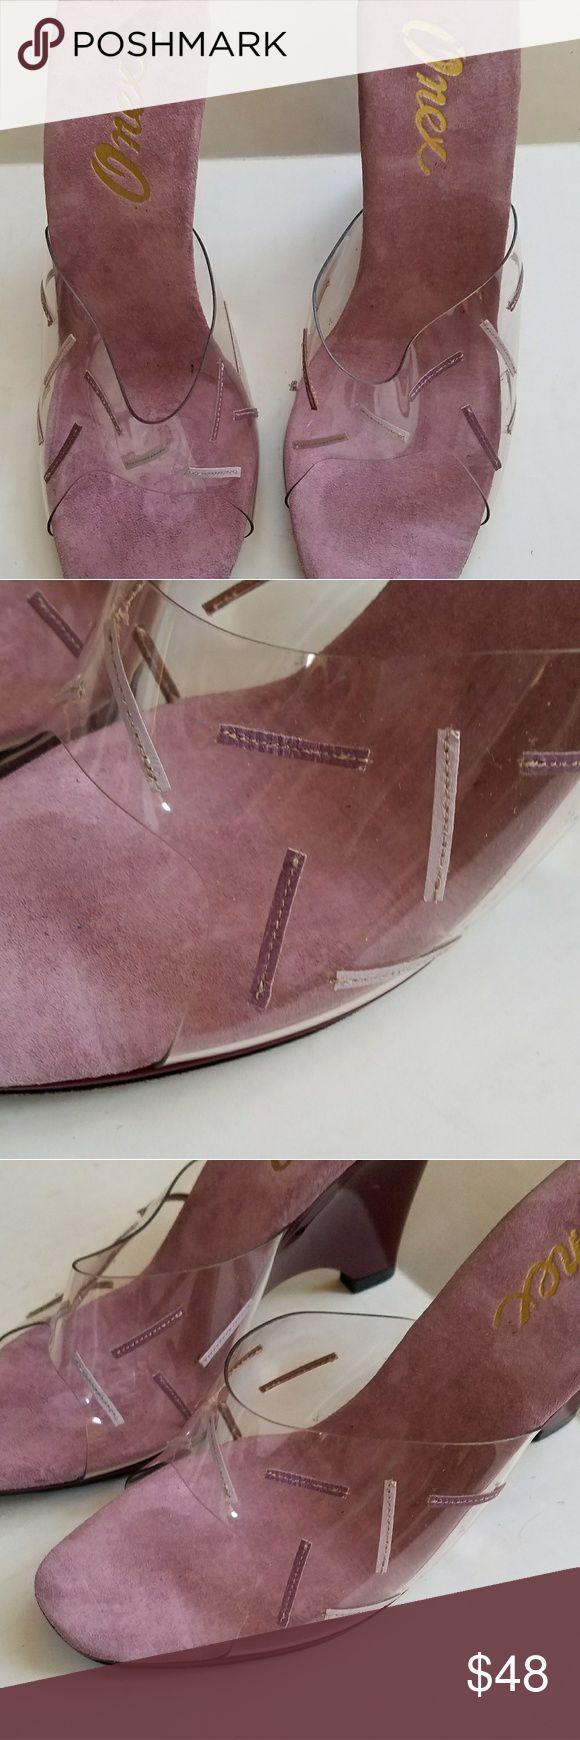 "Like new Onex peep toe slip on wedge heels sz 8 Gorgeous 3 1/2"" heel #e Onex Shoes Heels"